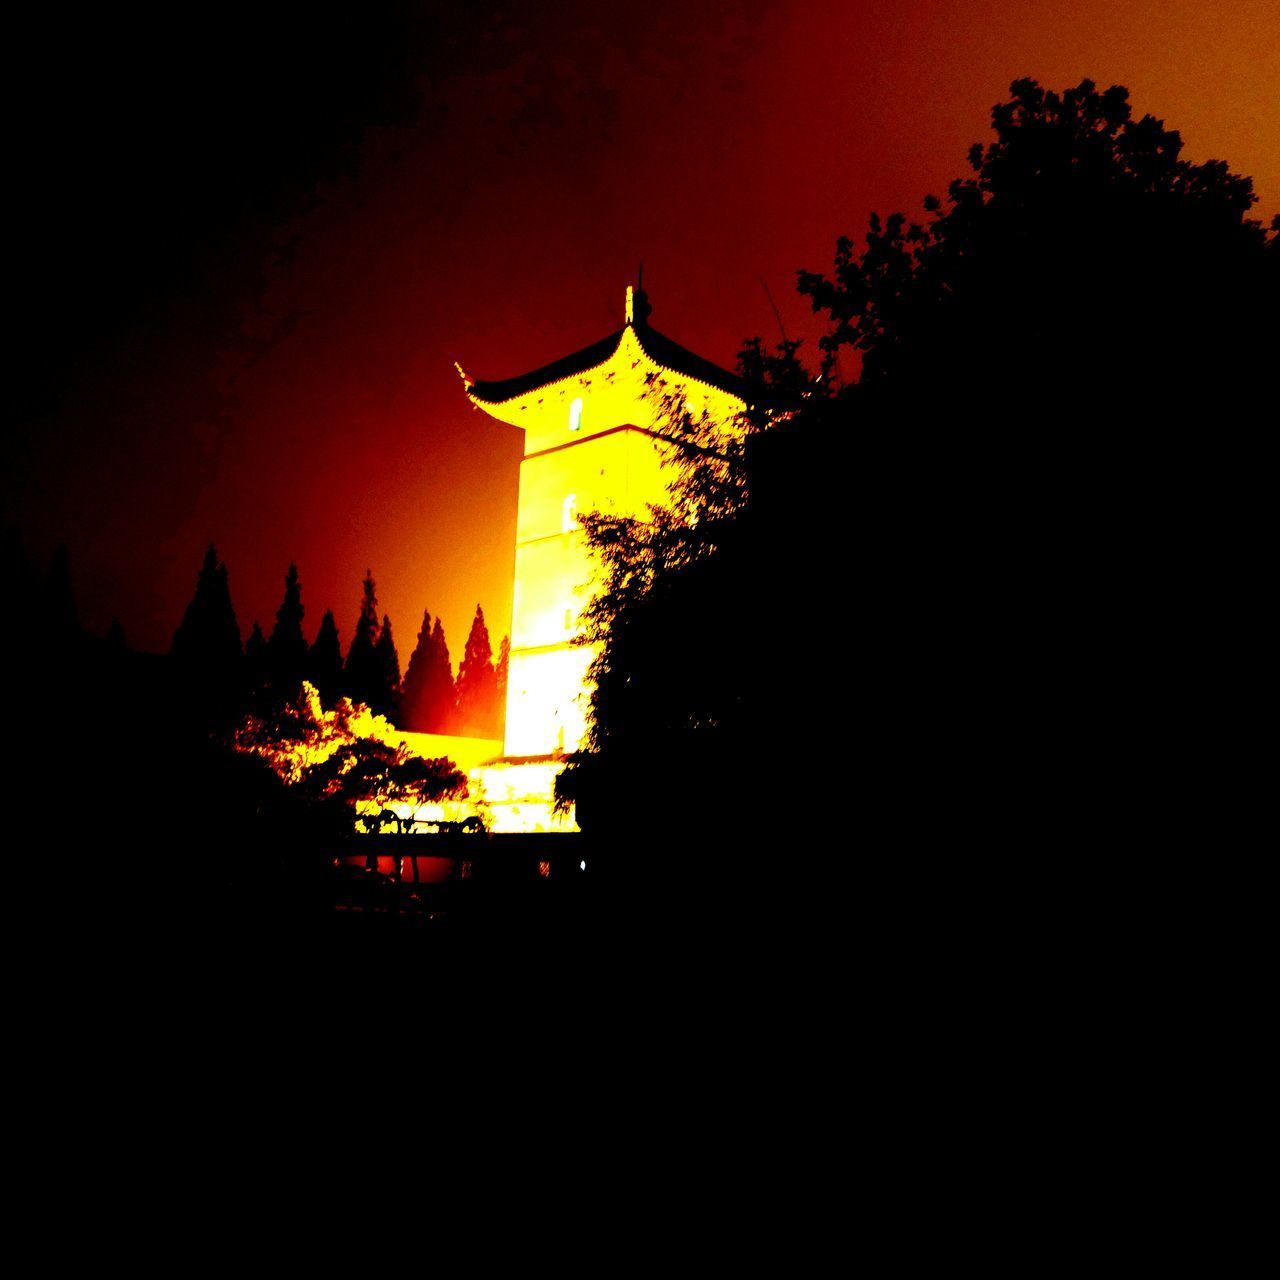 富士 苏州 风景 旅游 China Night Heyworld Take Photos Traveling Fujifilm Colors